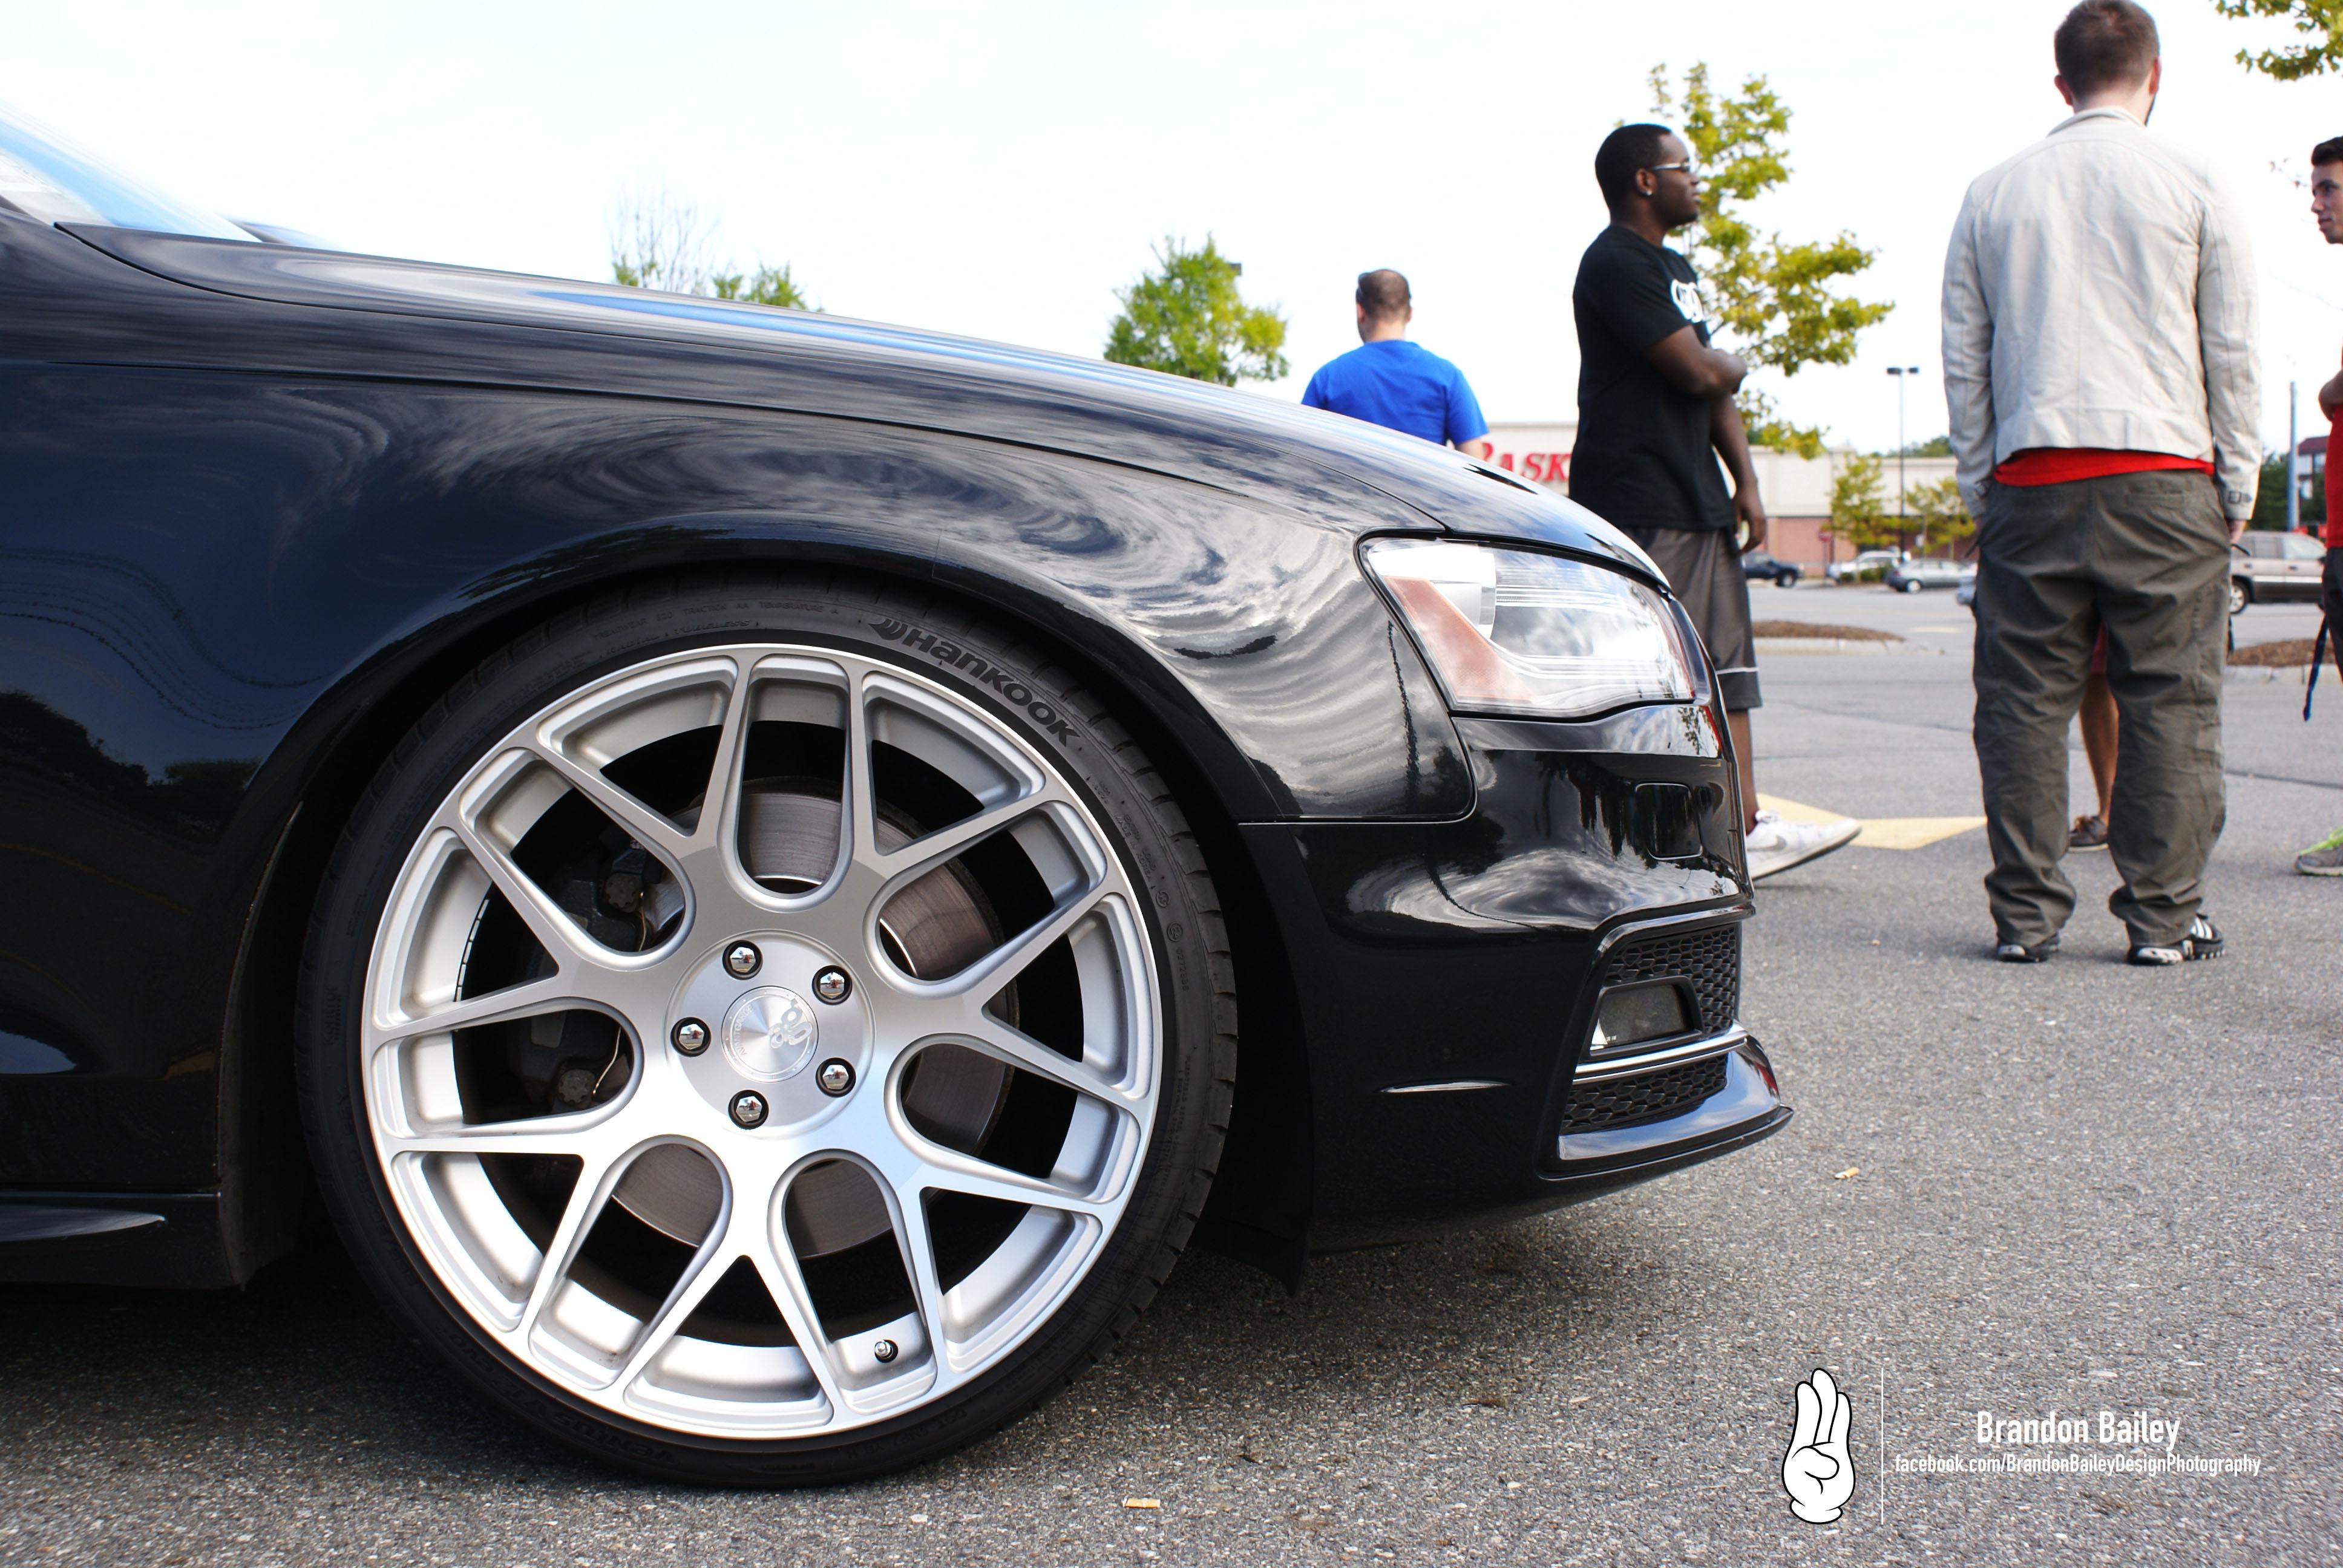 Audi S4 B8 5 On Avant Garde M590